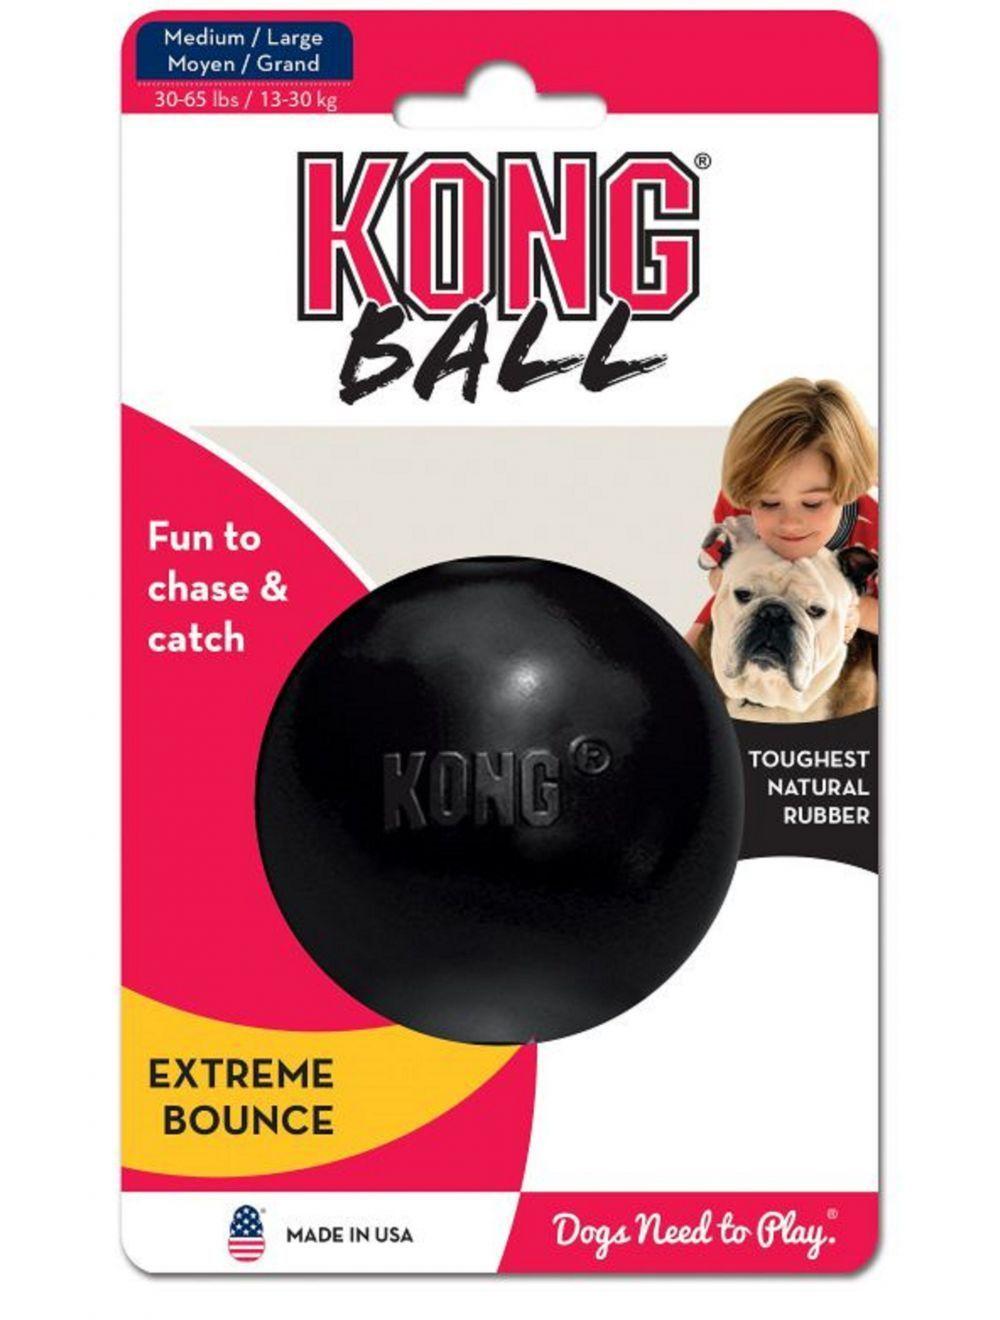 Kong perro caucho extreme pelota medium-large